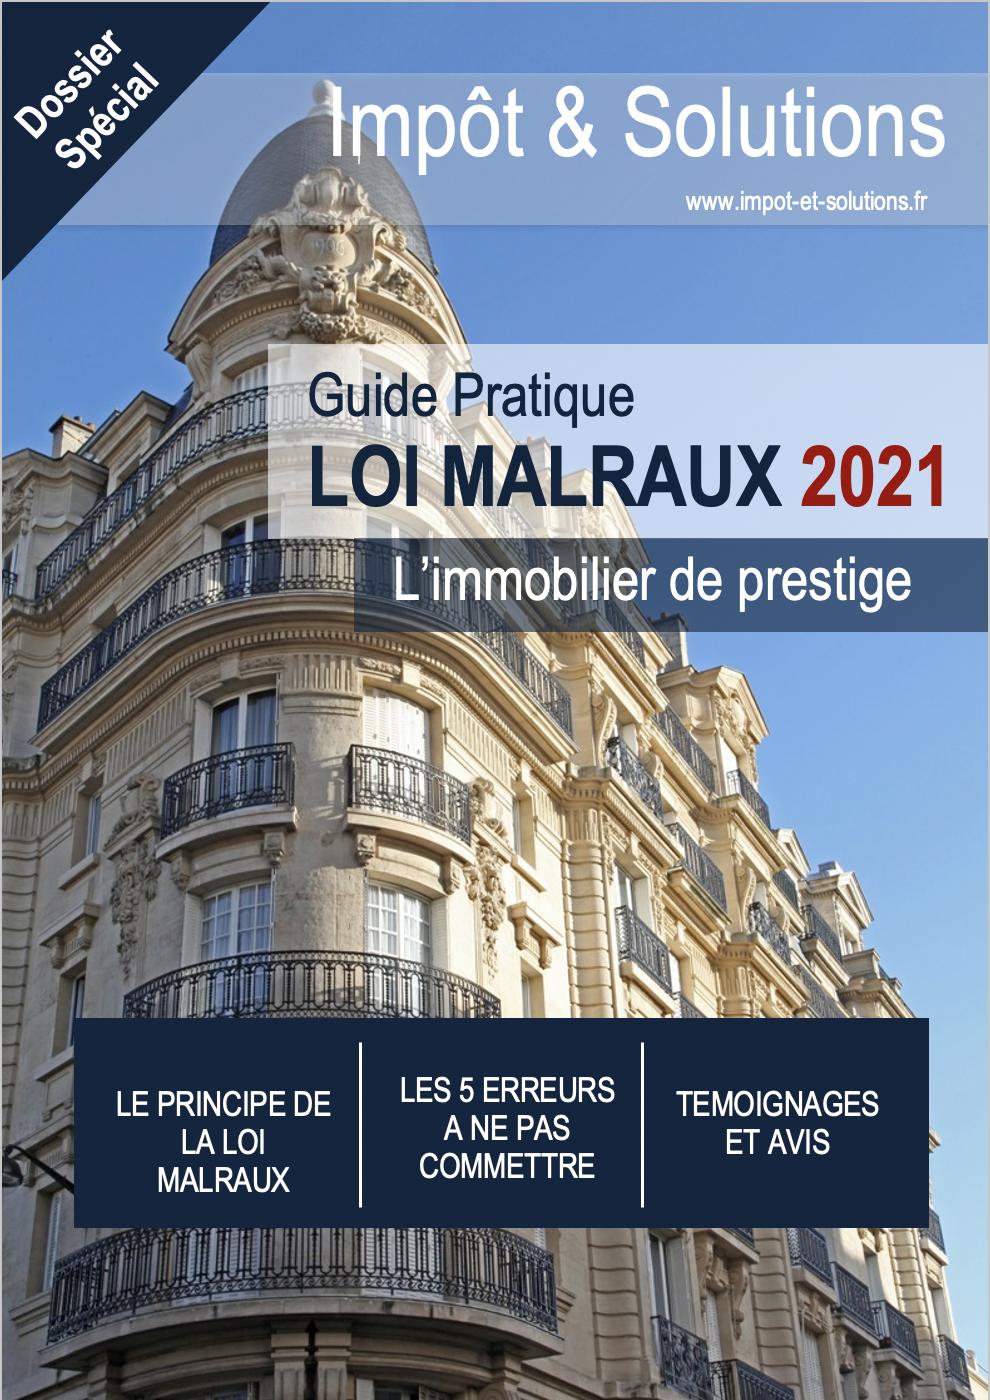 Guide Loi Malraux 2021